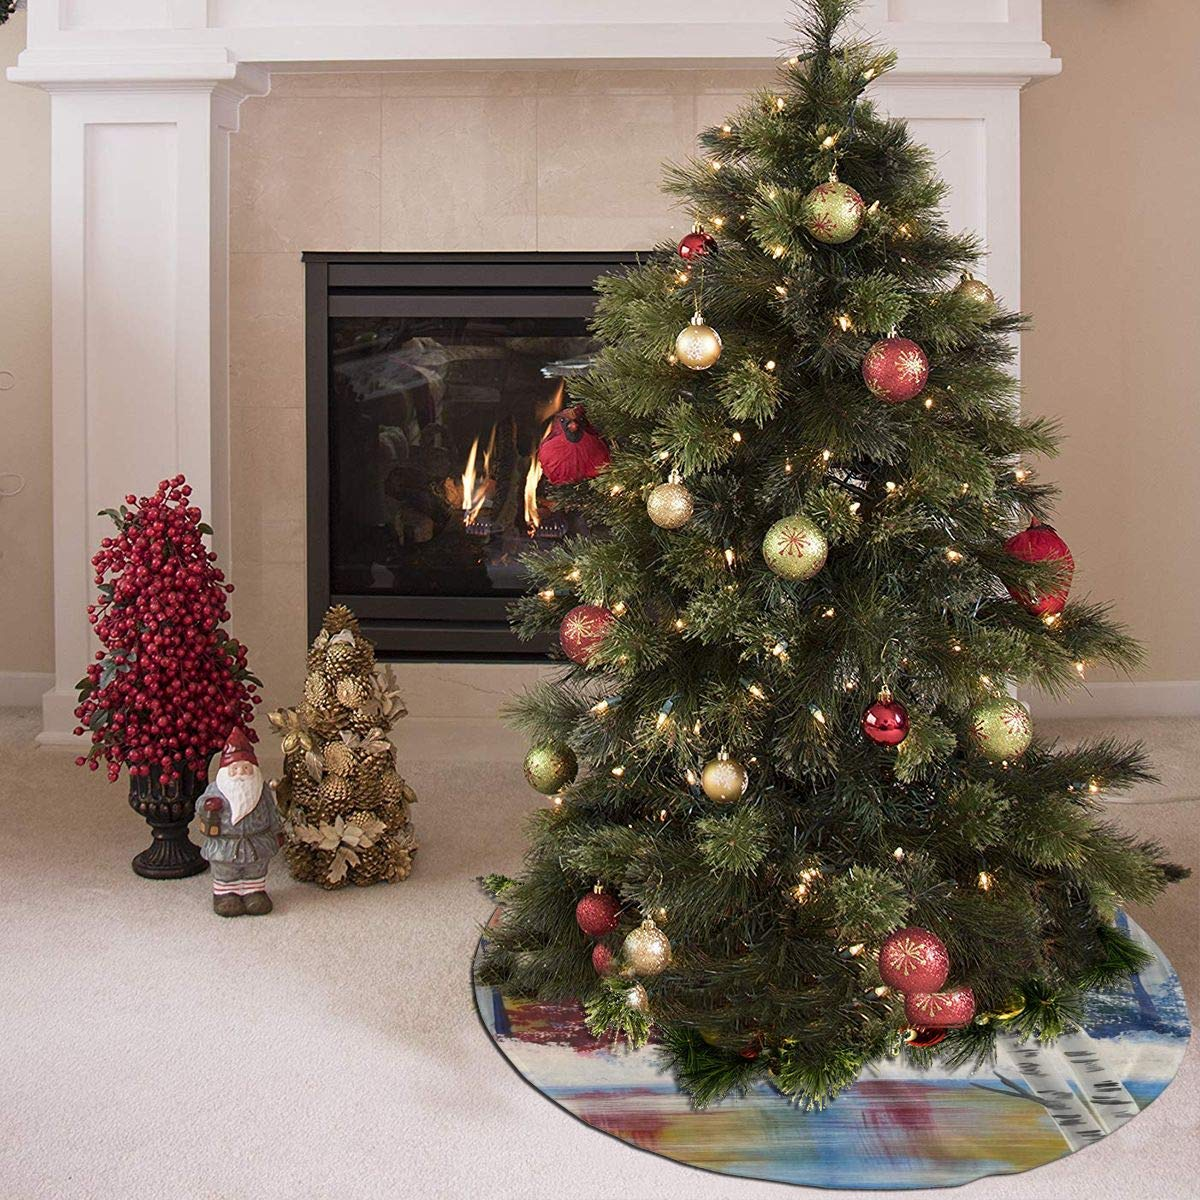 LUharbor Christmas Xmas Tree Skirt Treeskirt 35.5 Inch Tree Tree Skirt